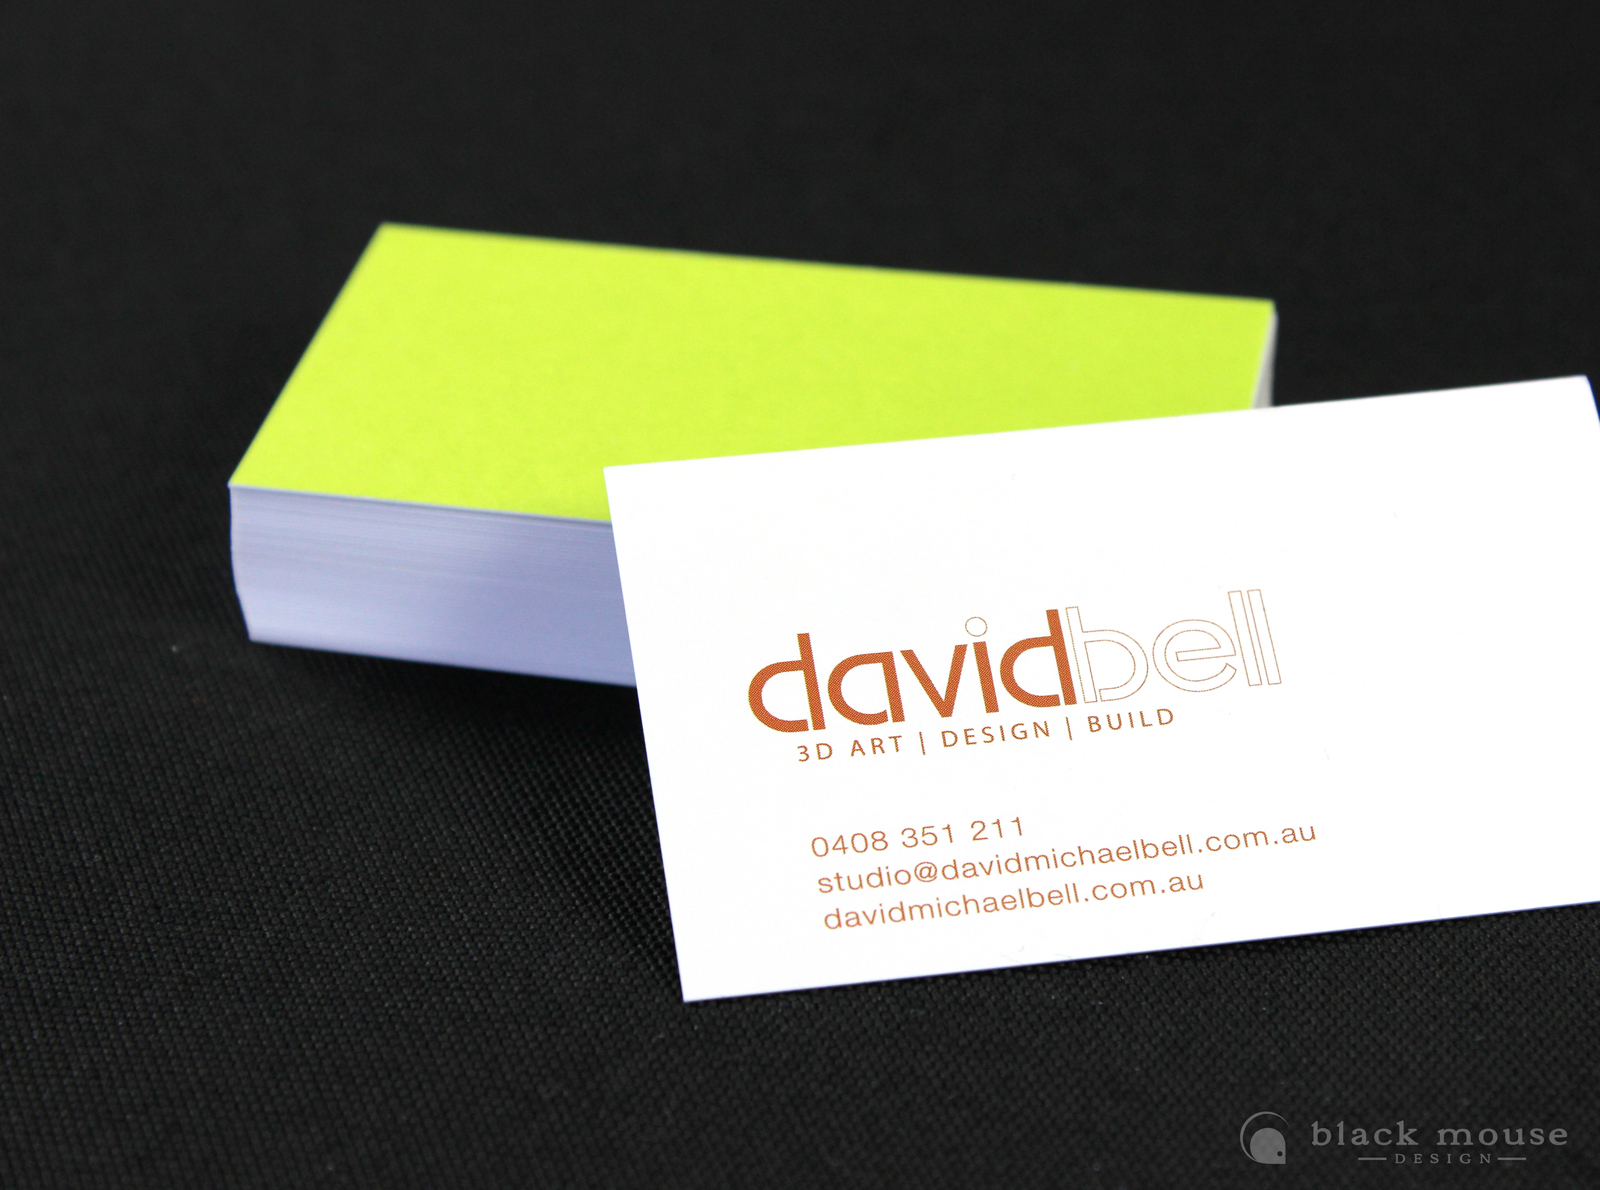 david_bell_003